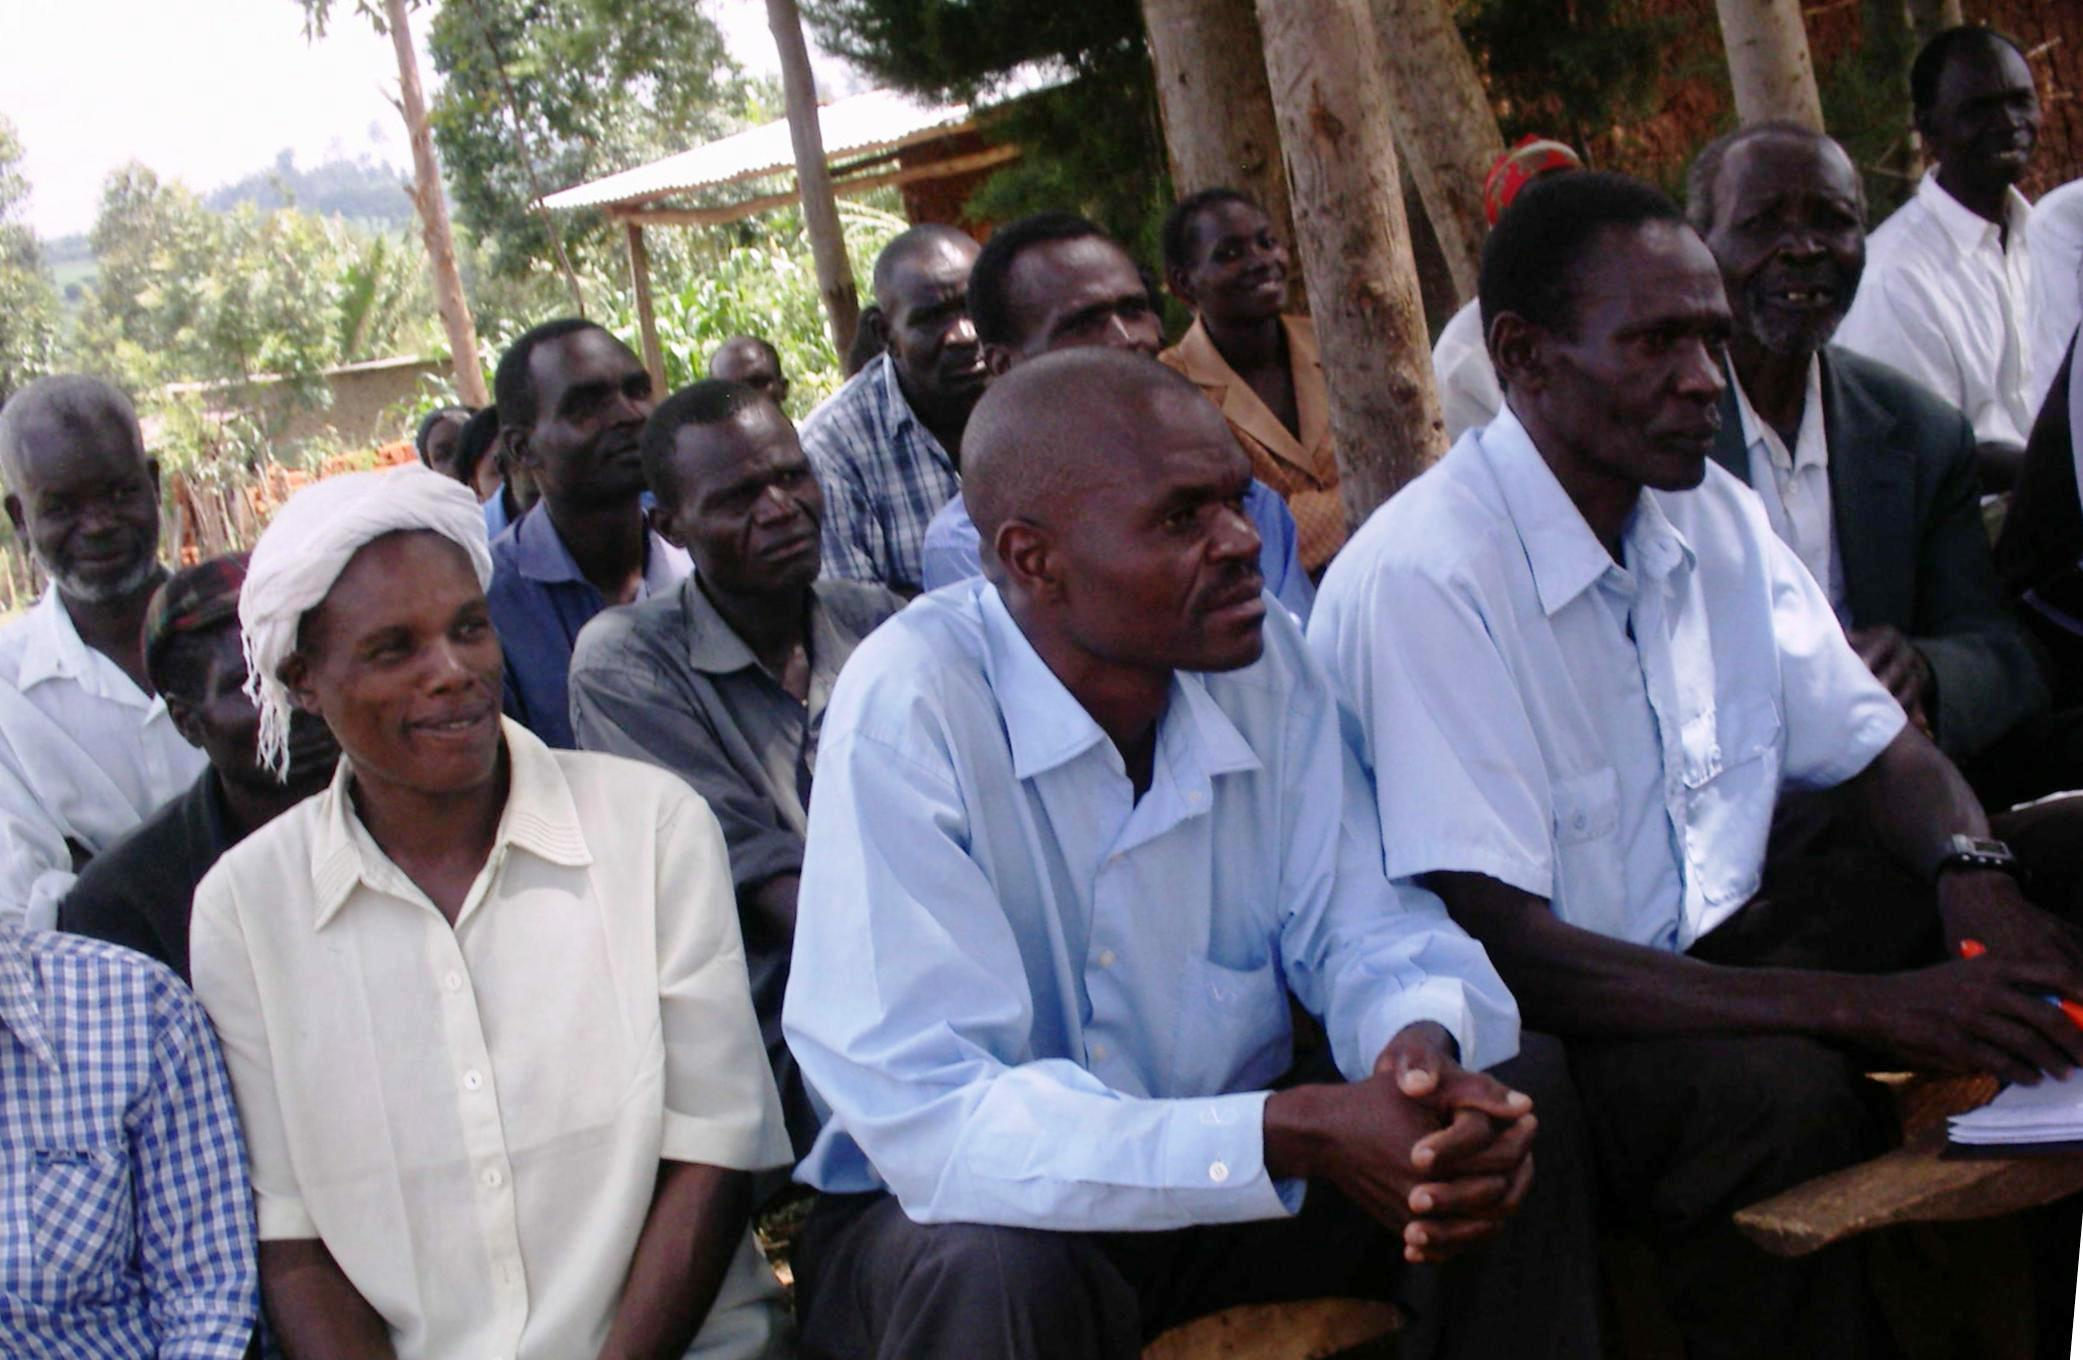 The Water Project : kiminini-community-health-representatives-attending-sabata-wash-training